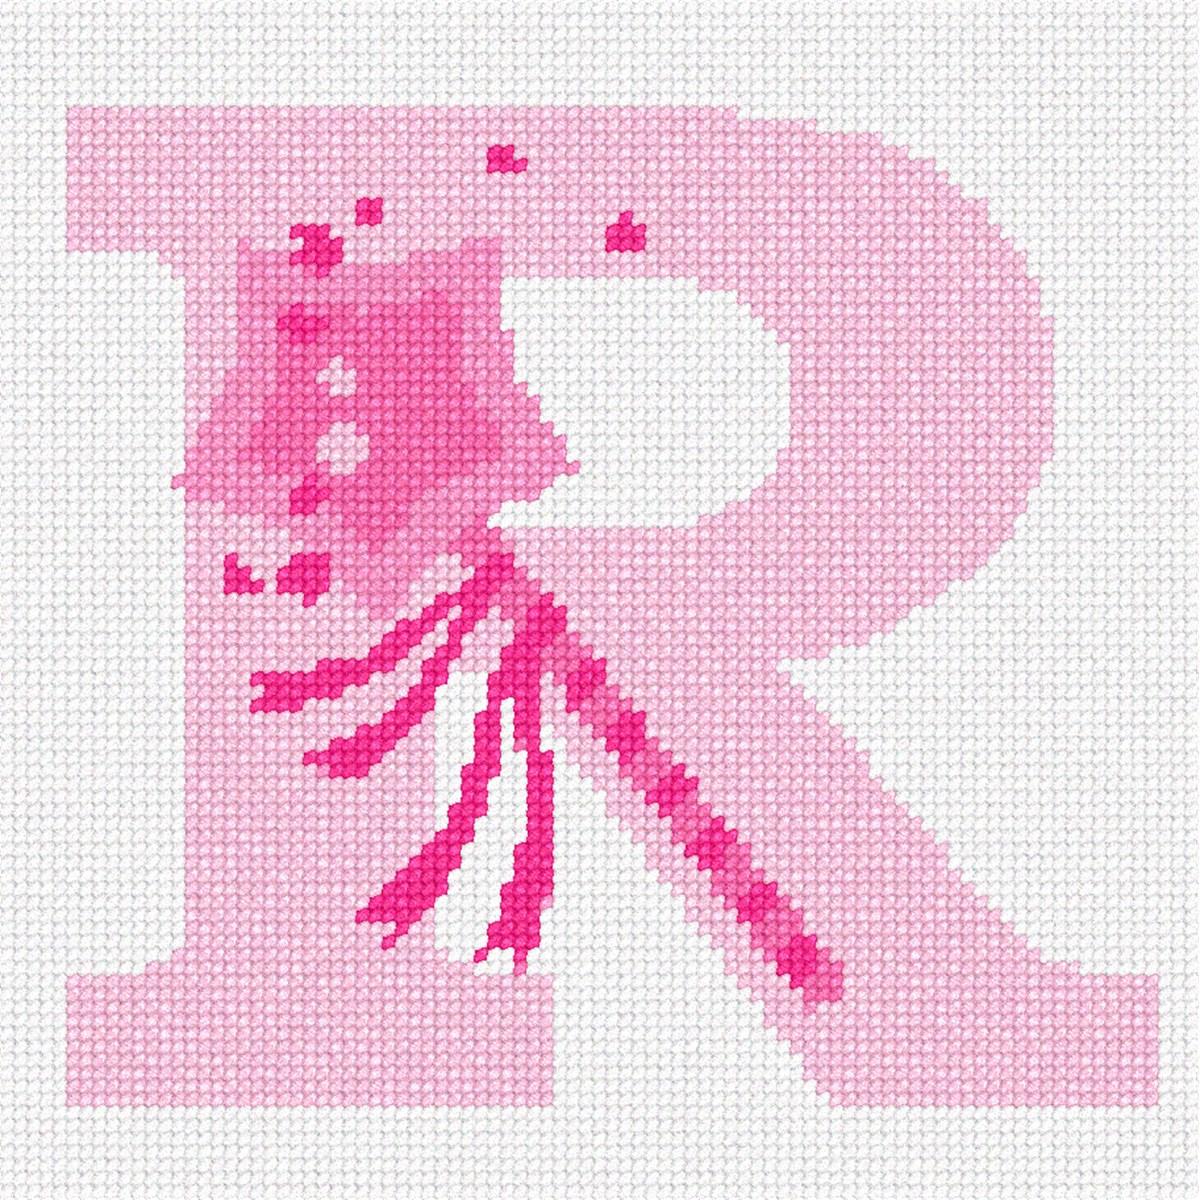 pepita Letter R Illusion Needlepoint Kit